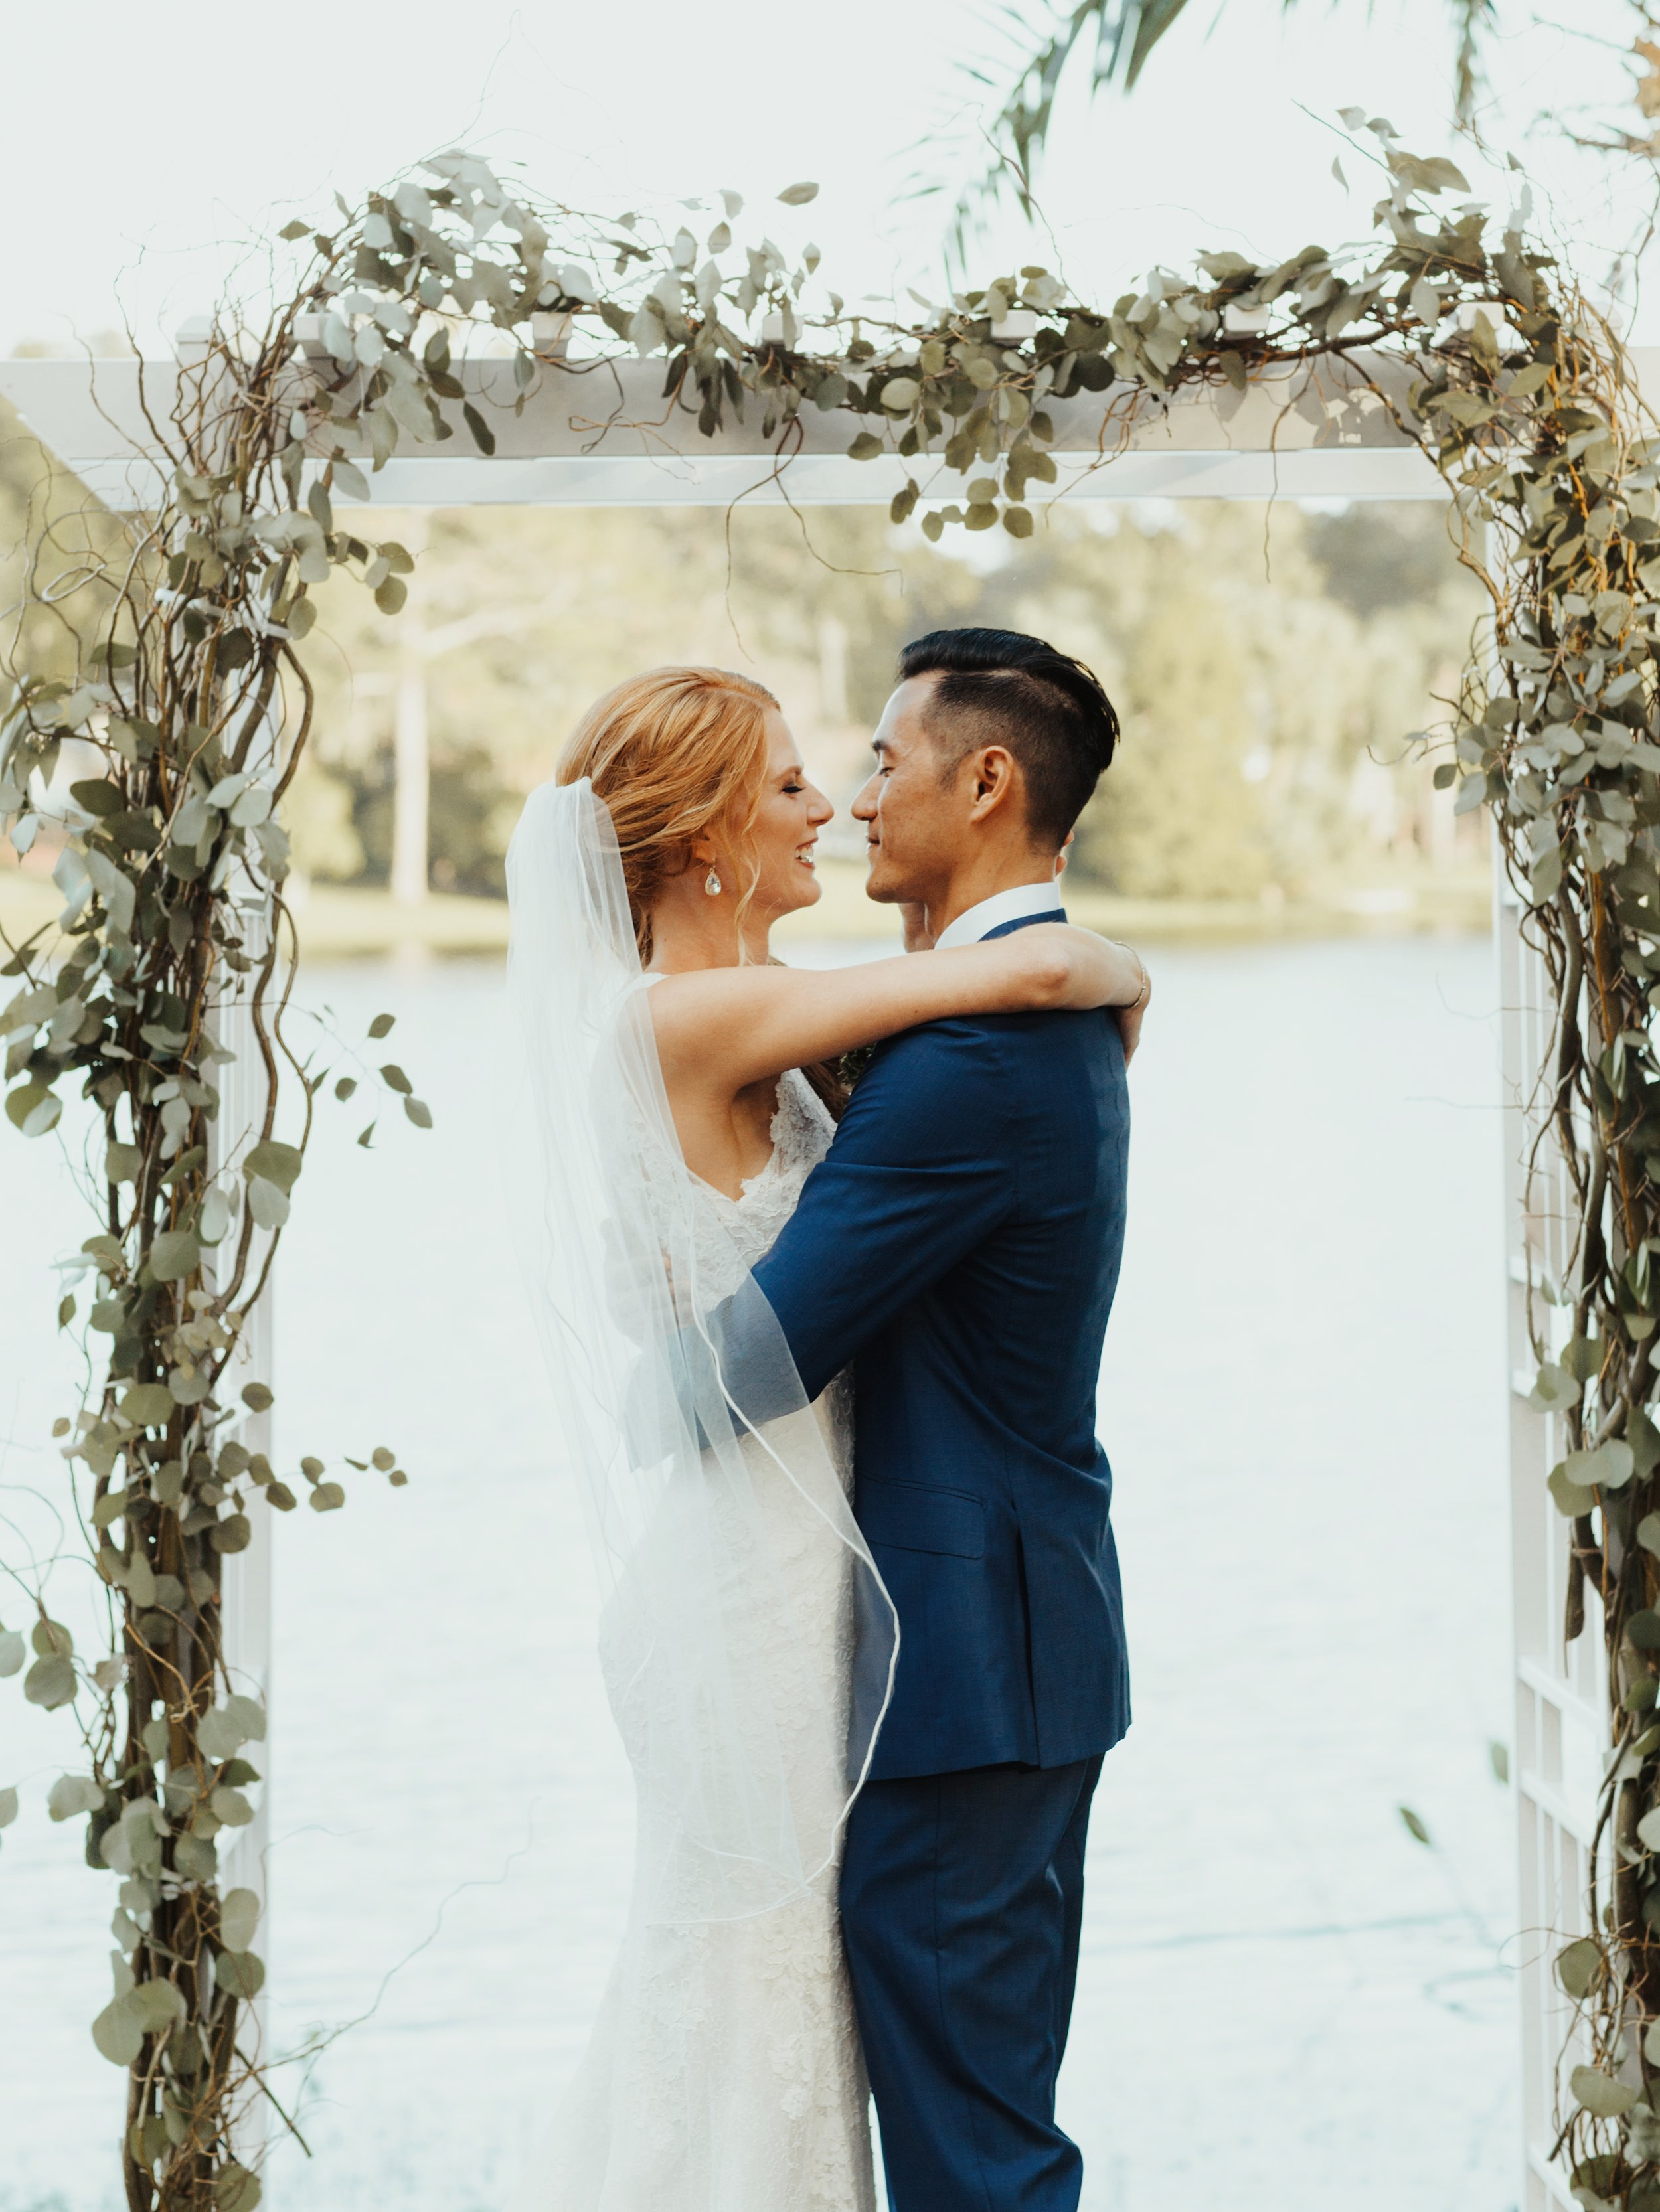 Wedding Day | Vanessa Boy | vanessaboy.com-693.com .jpg